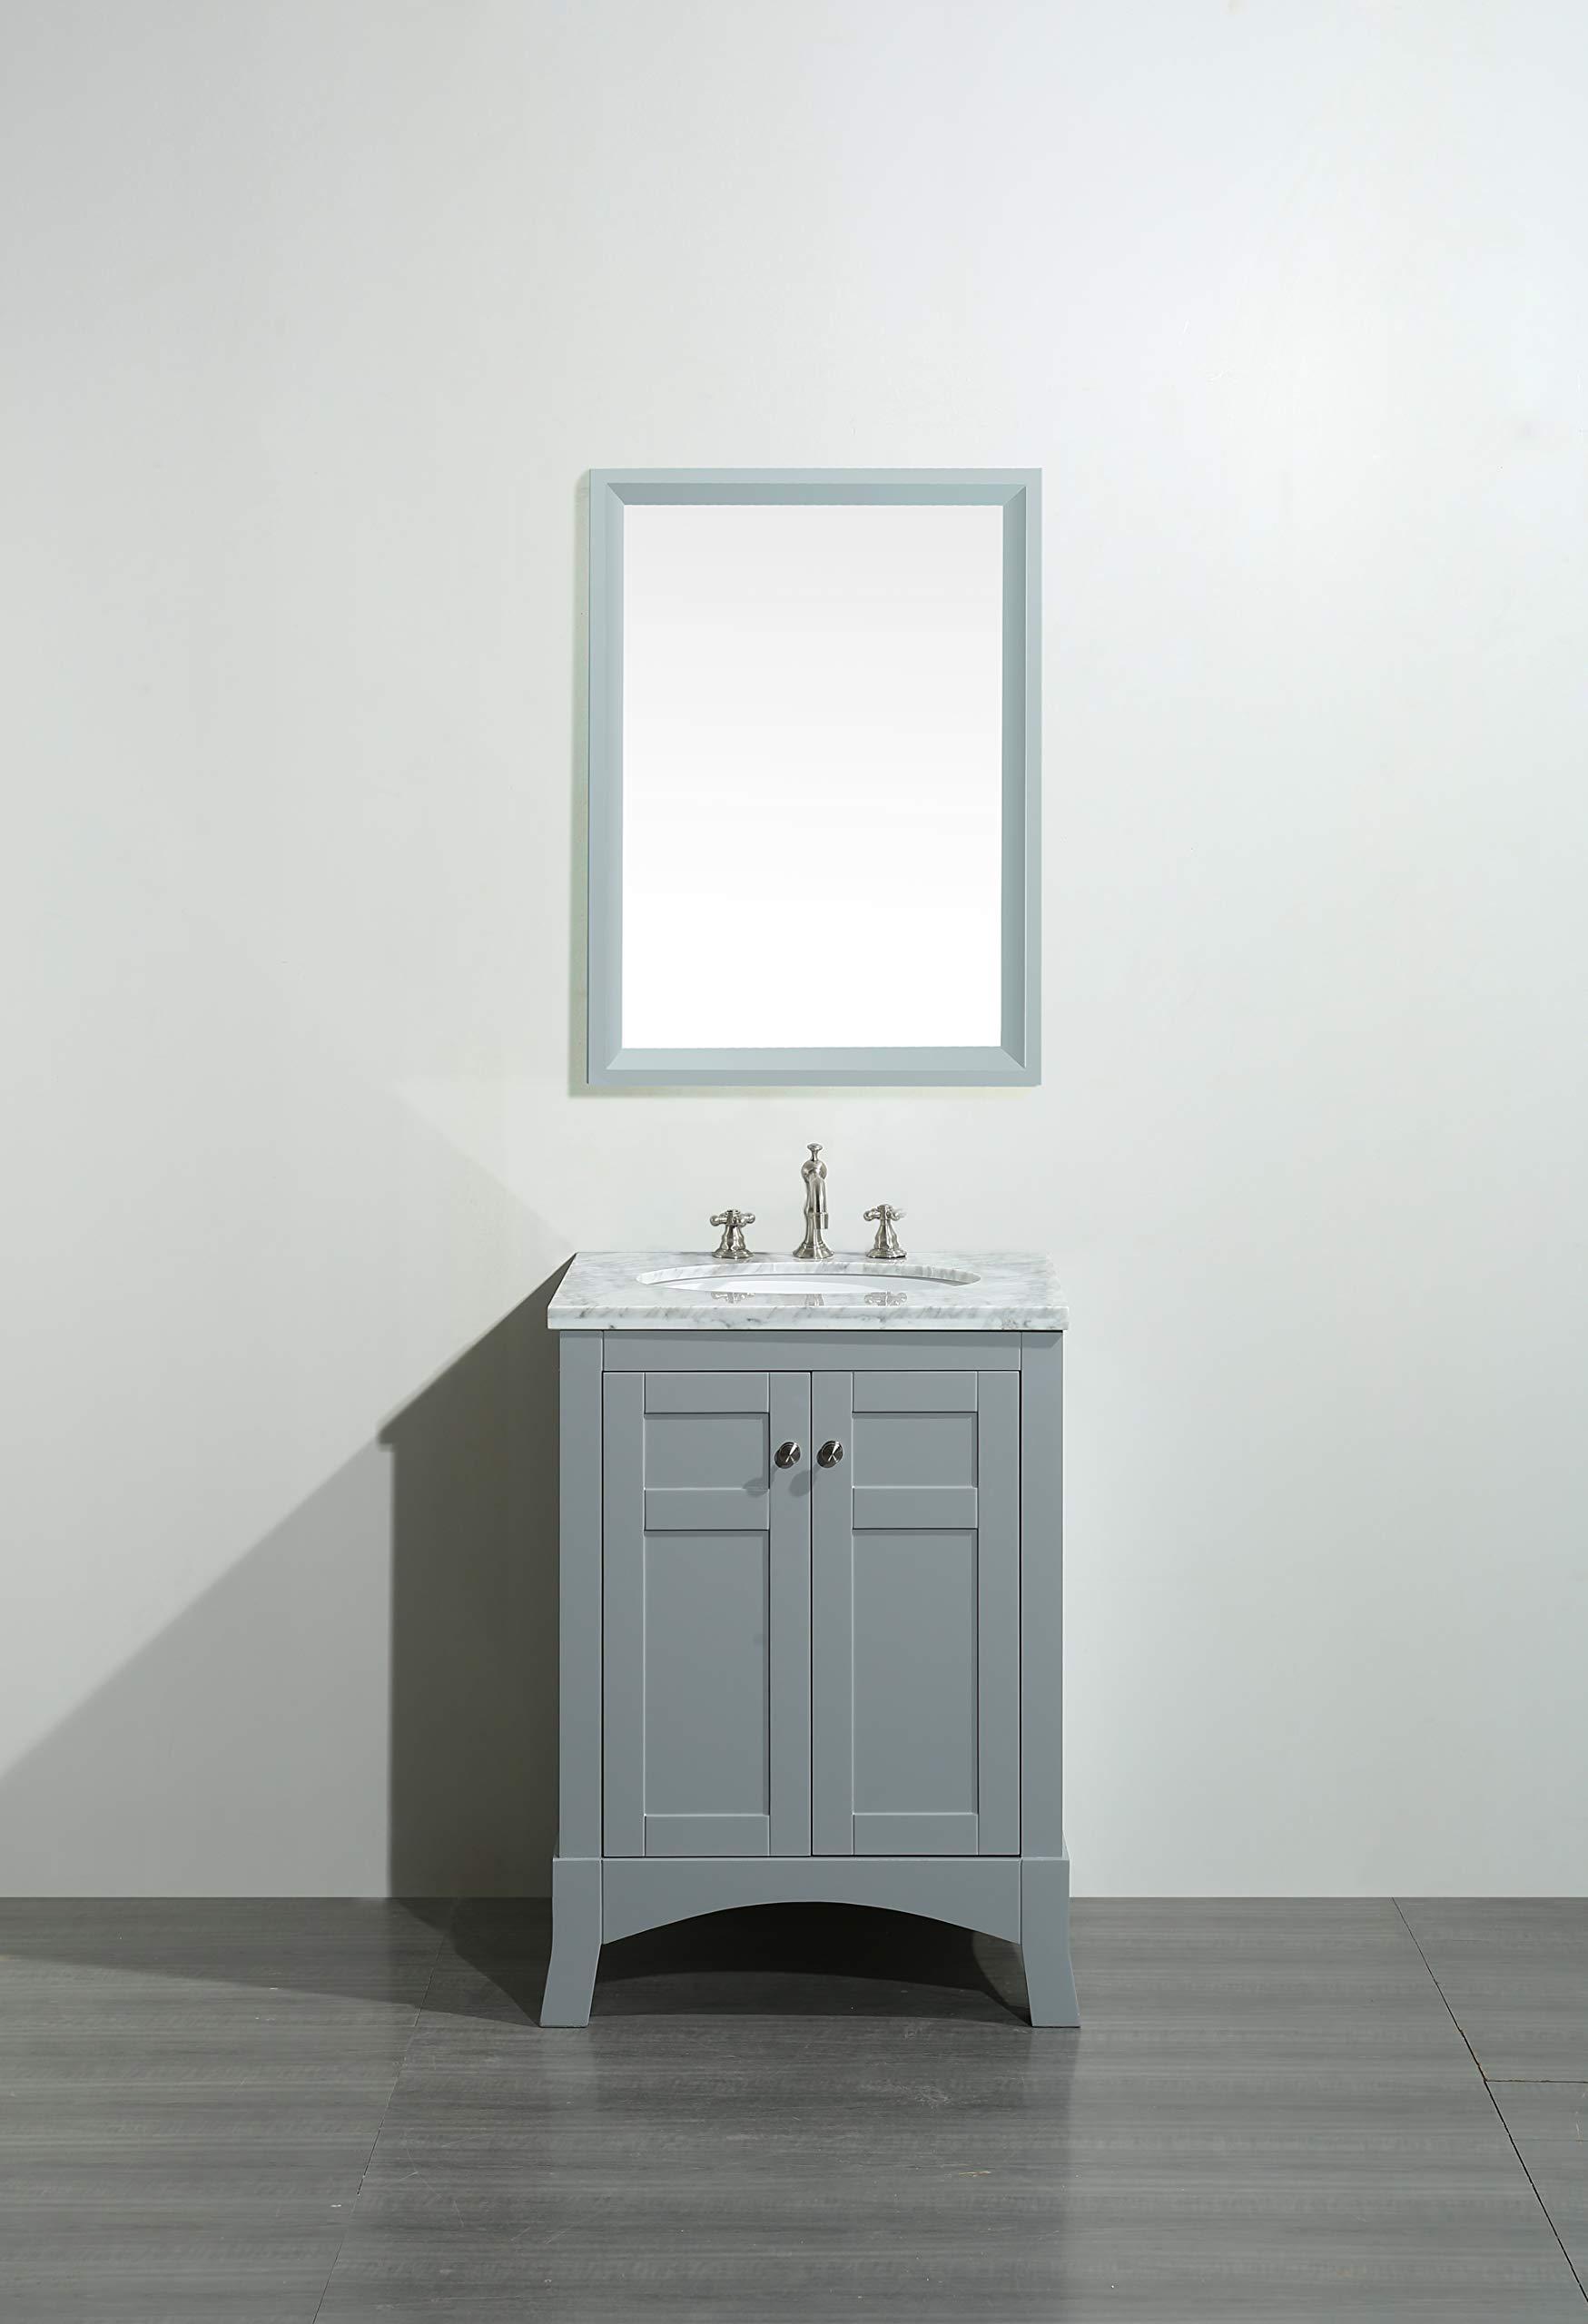 Eviva New York 24 Inch Gray Bathroom Vanity With White Carrara Countertop And Undermount Porcelain Sink Amazon Com